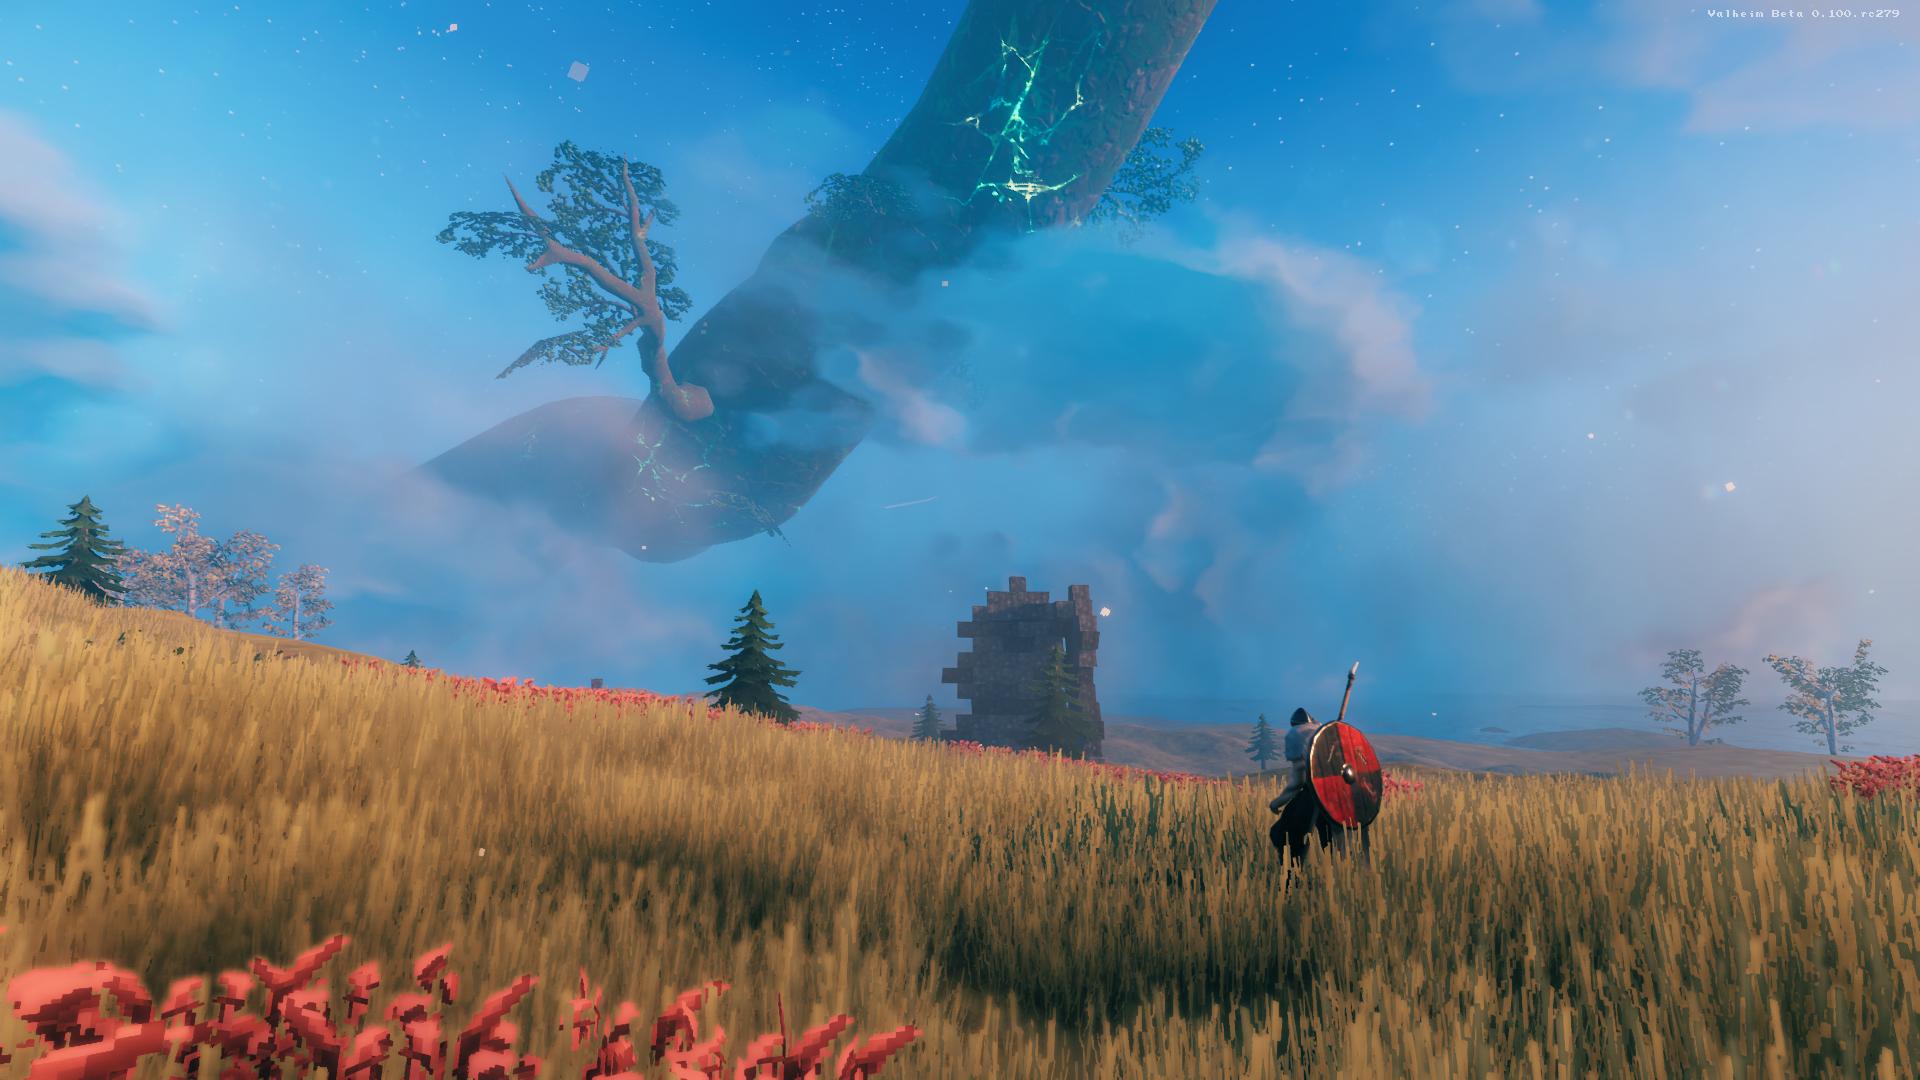 Explore new biomes to advance in Valheim